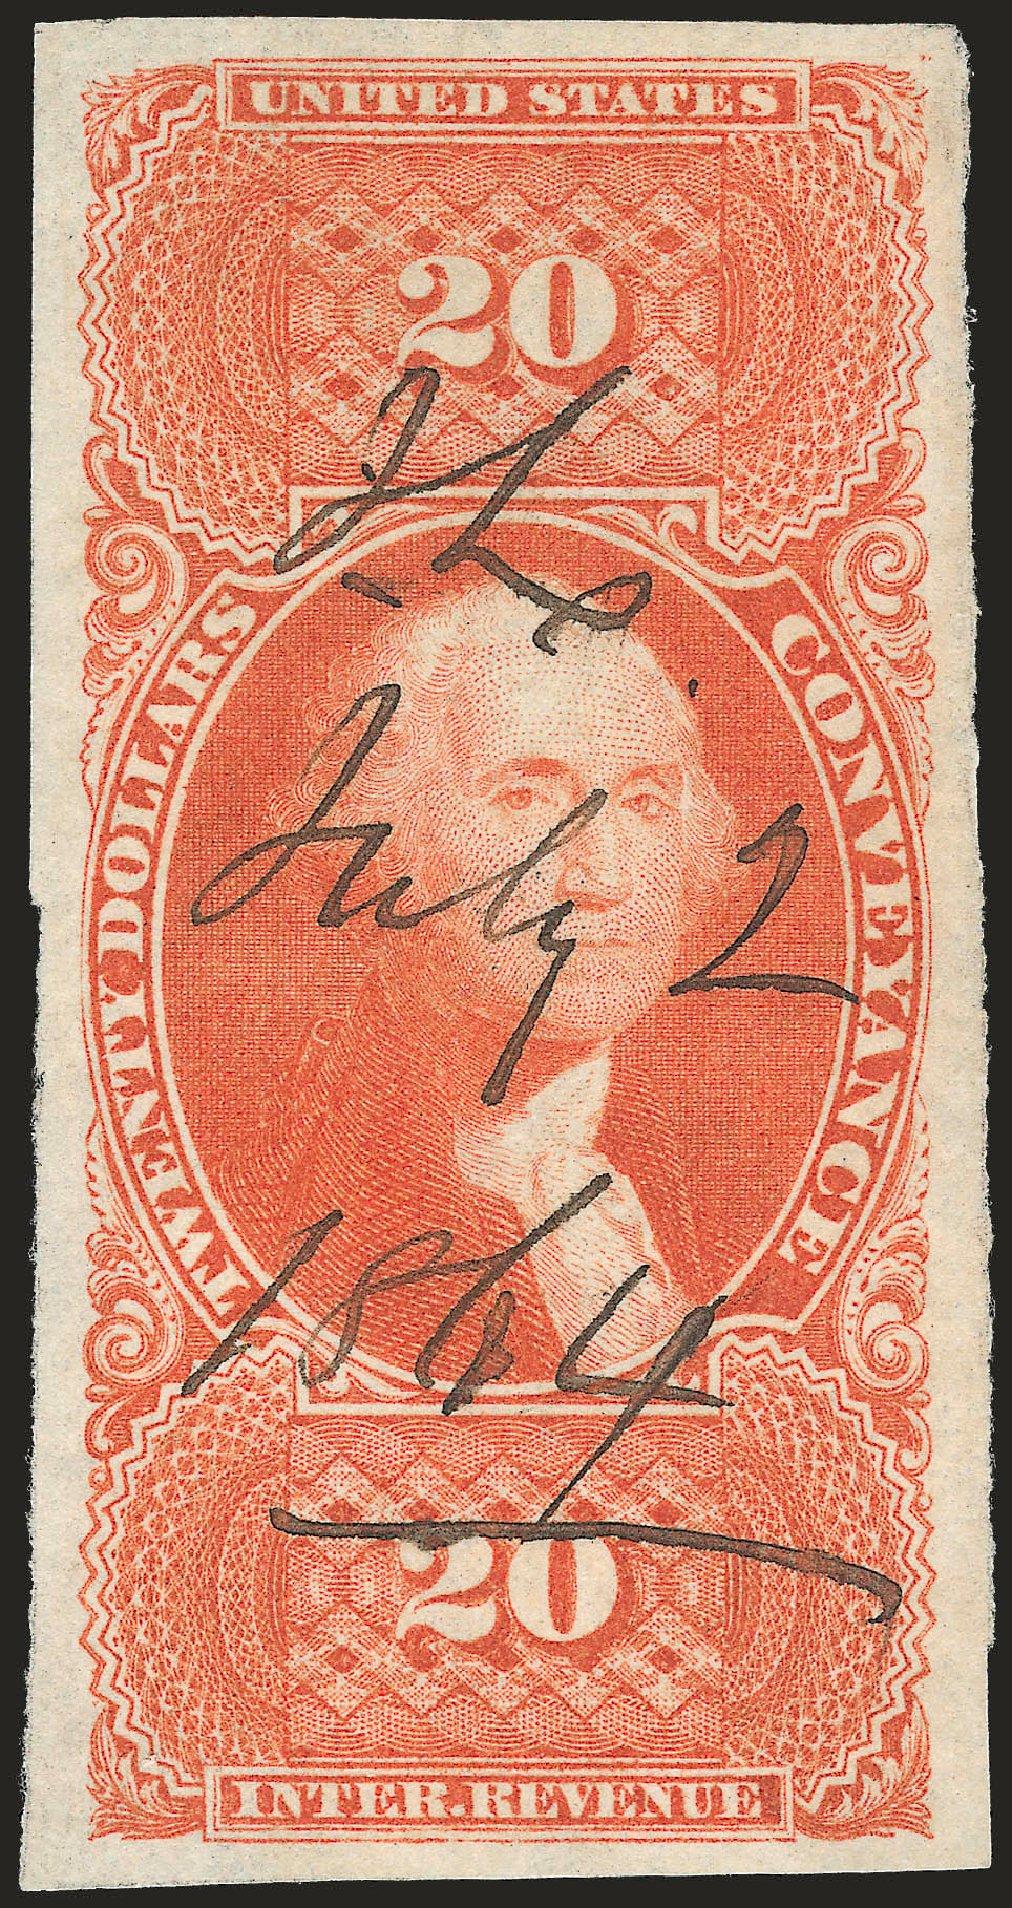 US Stamp Prices Scott # R98 - 1862 US$20.00 Revenue Conveyance. Robert Siegel Auction Galleries, Jun 2009, Sale 975, Lot 2299